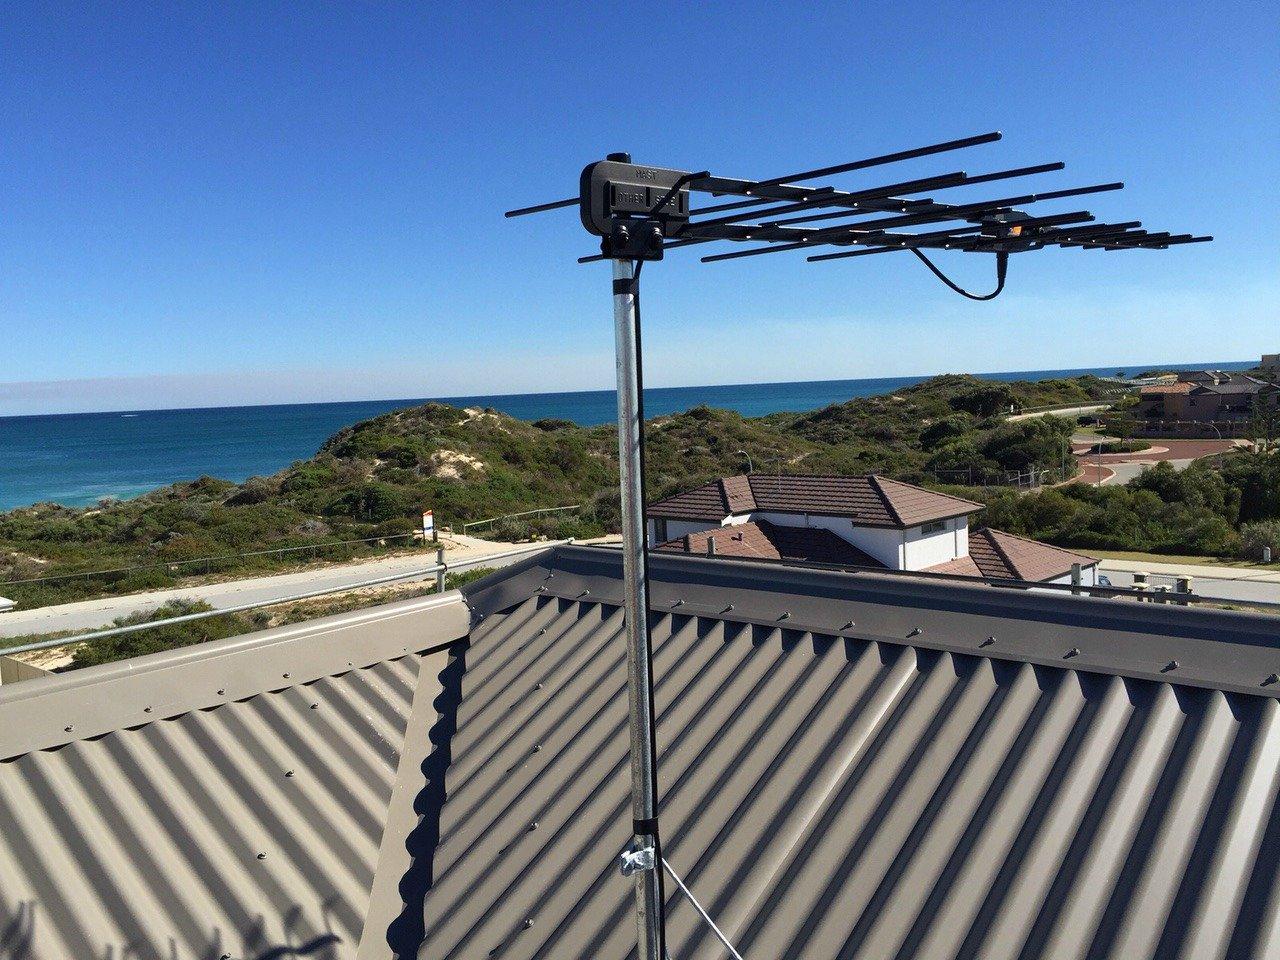 Jim's Antenna Installation SA - Call 131 546 - Open 7 Days